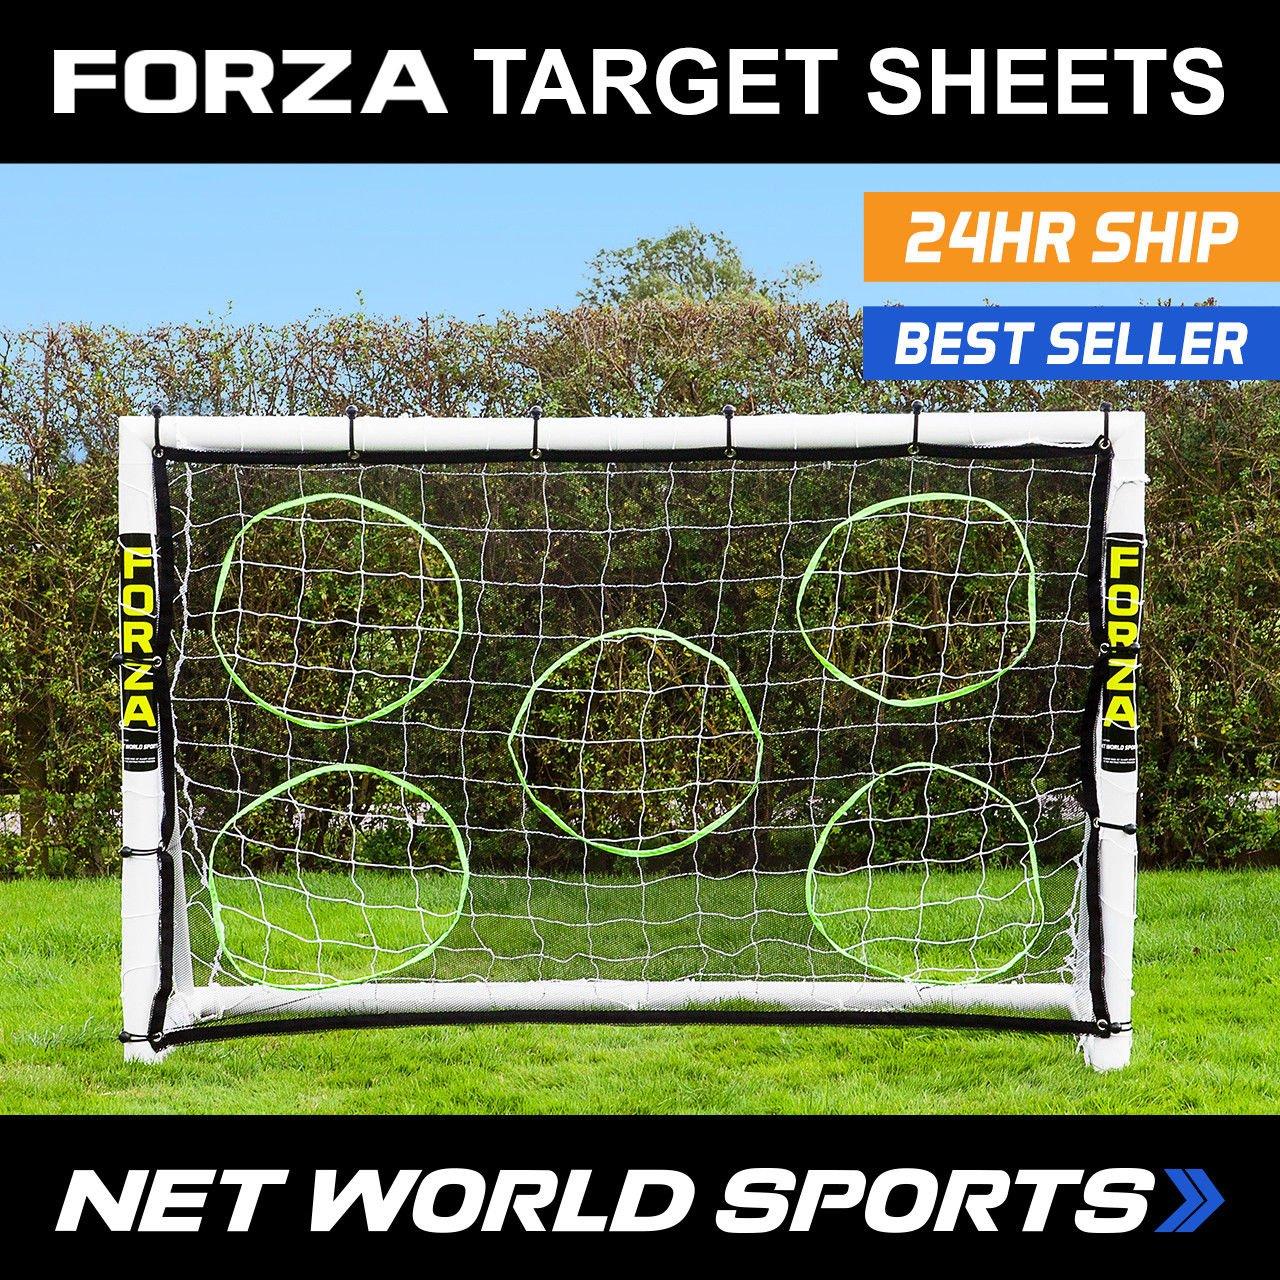 283038f56 Net World Sports Forza Soccer Goal Target Sheets